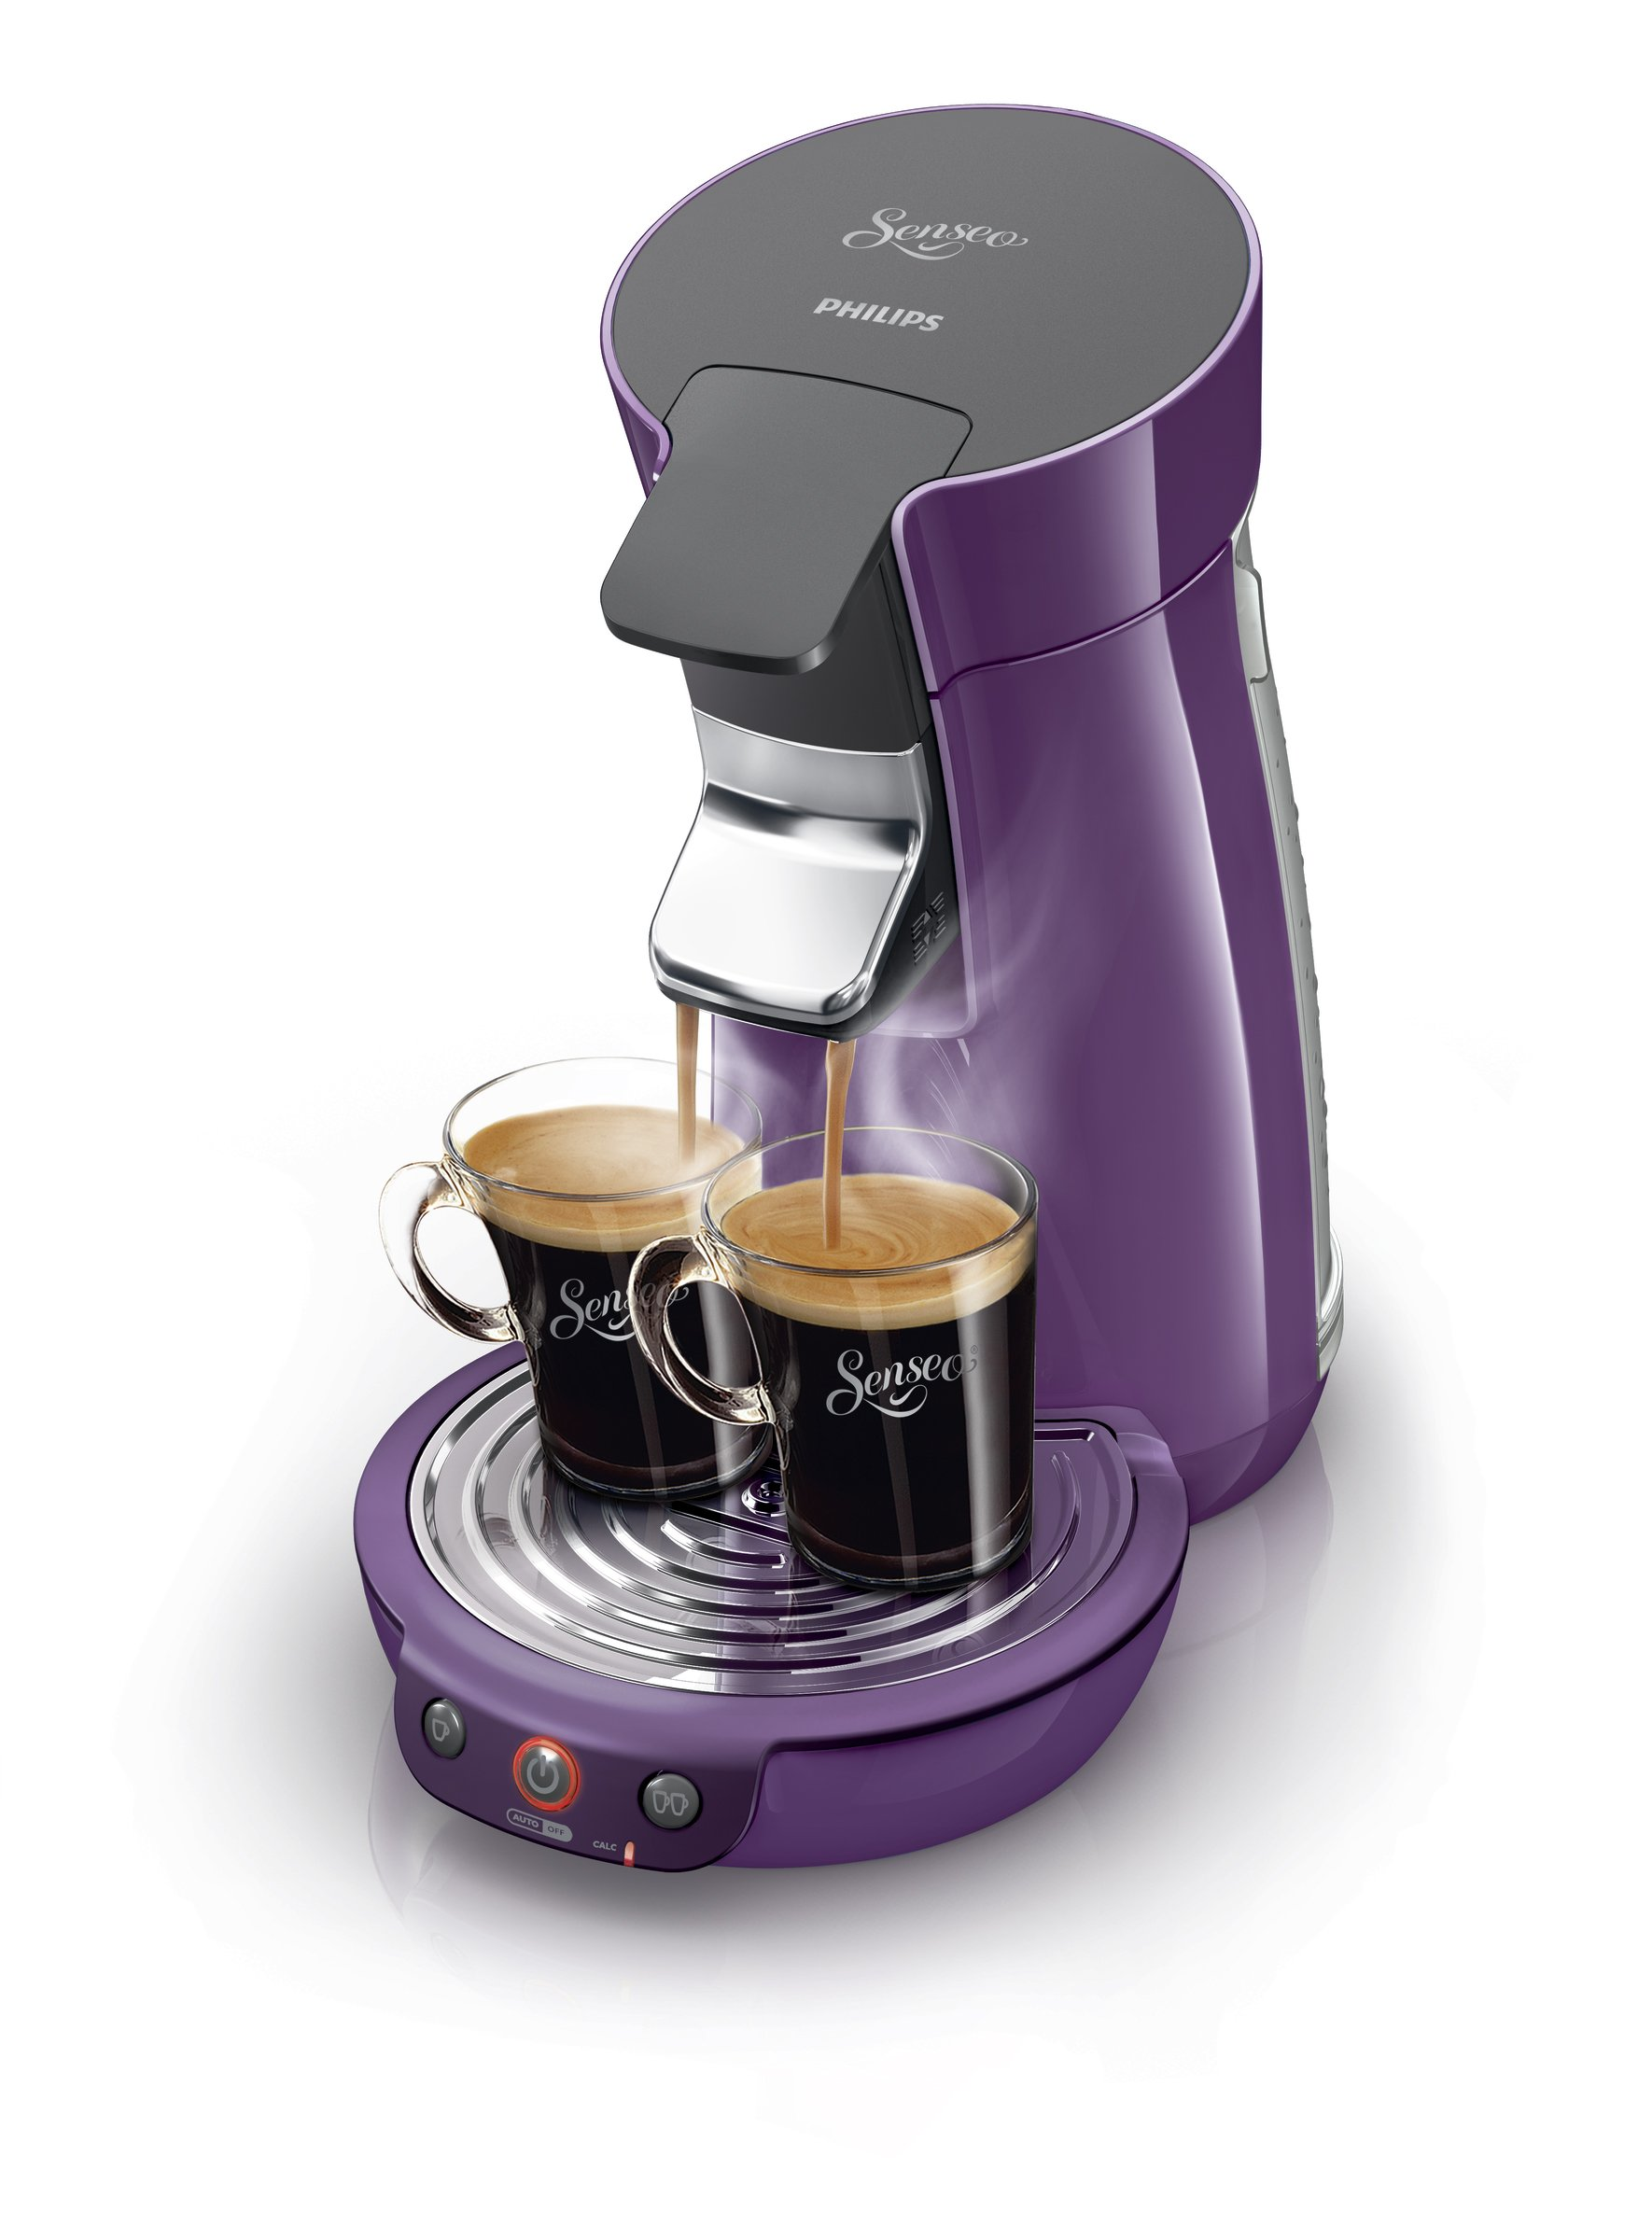 Philips Senseo Viva Café - Cafetera monodosis, color morado ...